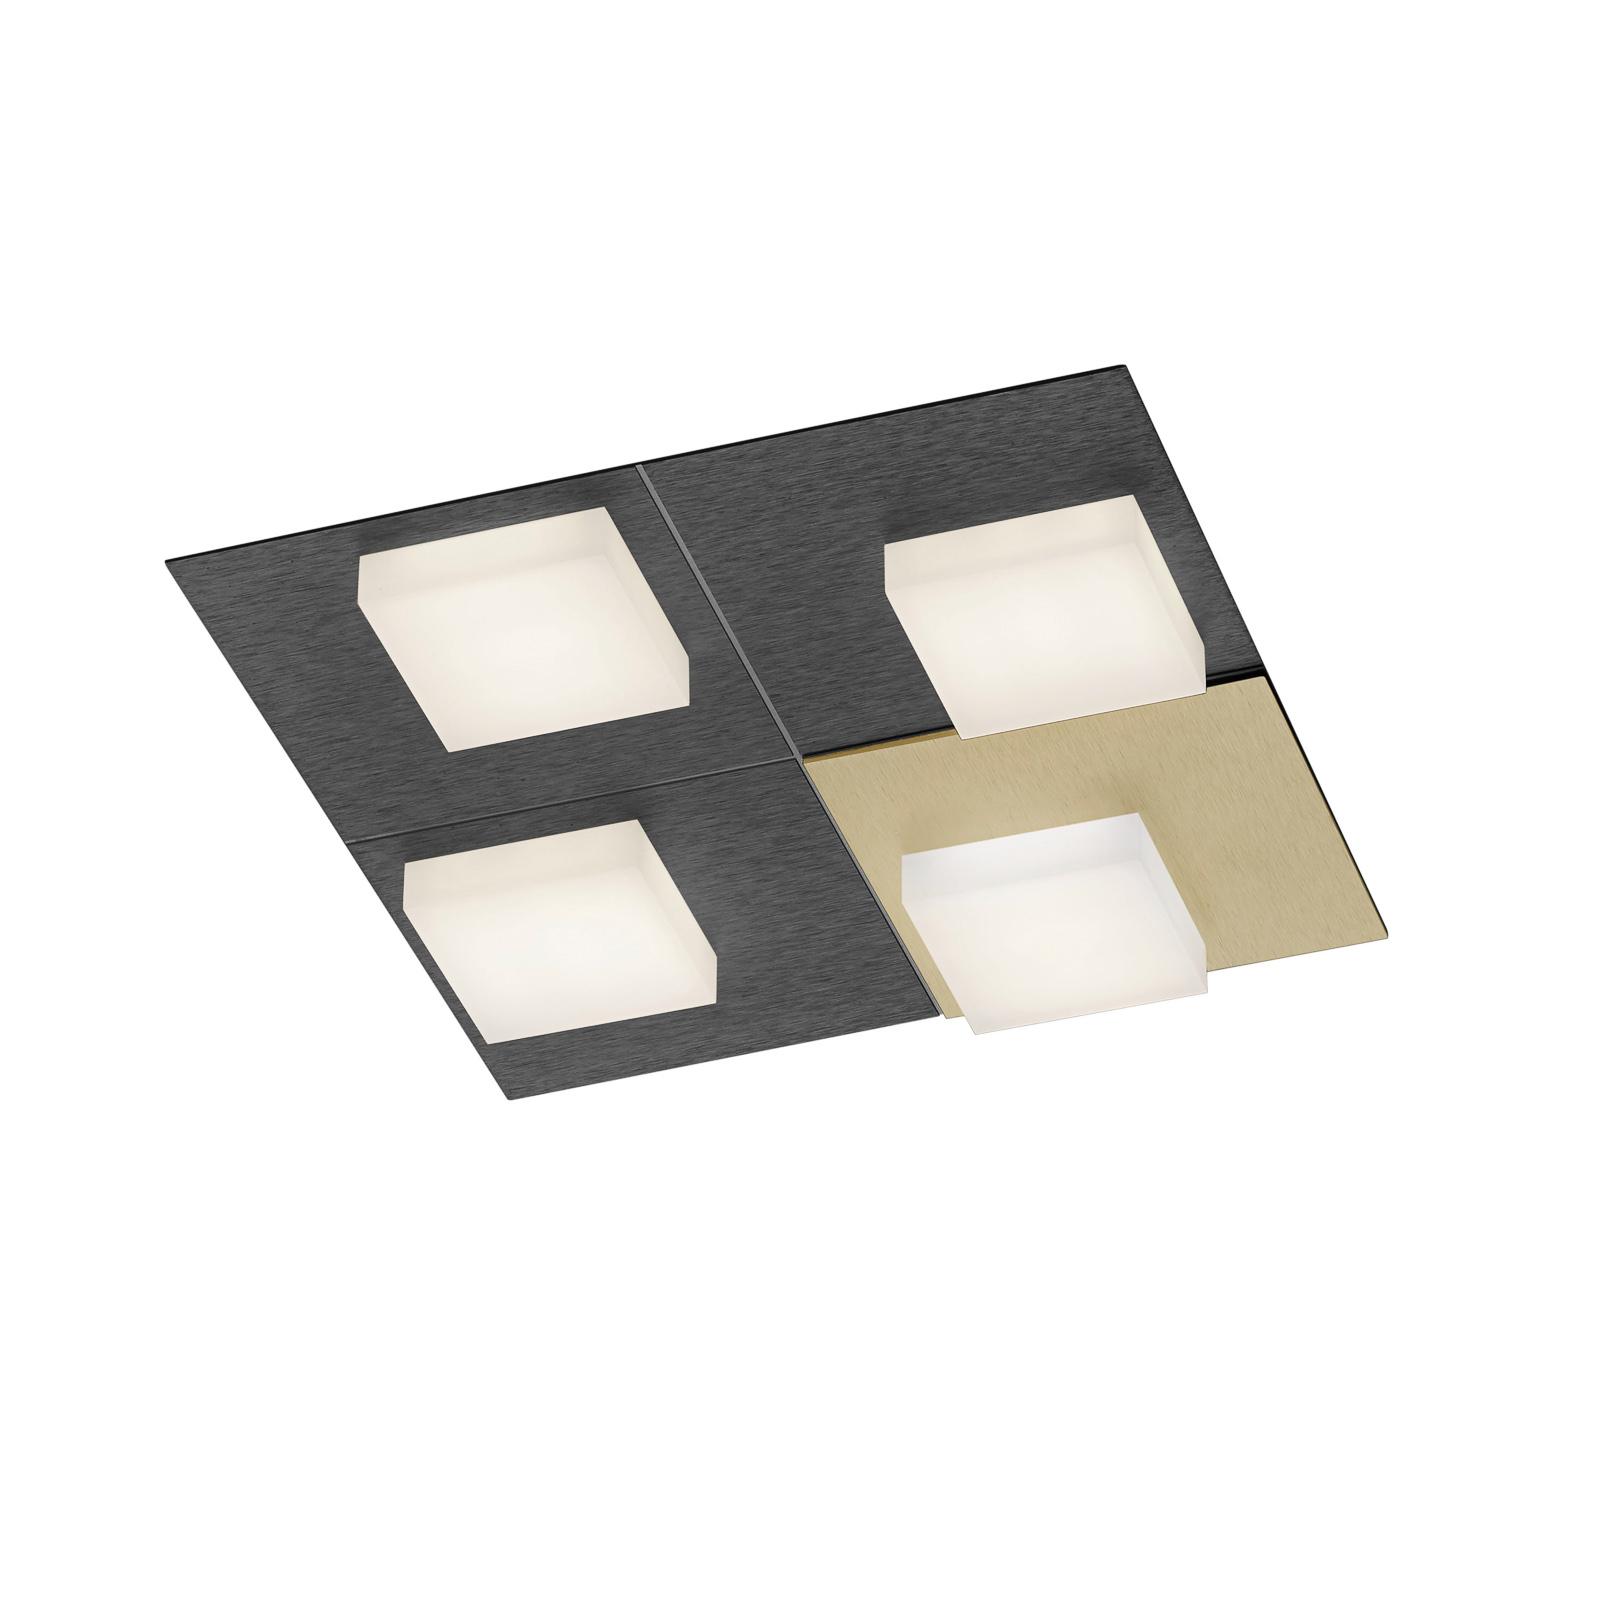 BANKAMP Cube loftlampe 32 W, 28x28 cm, antracit